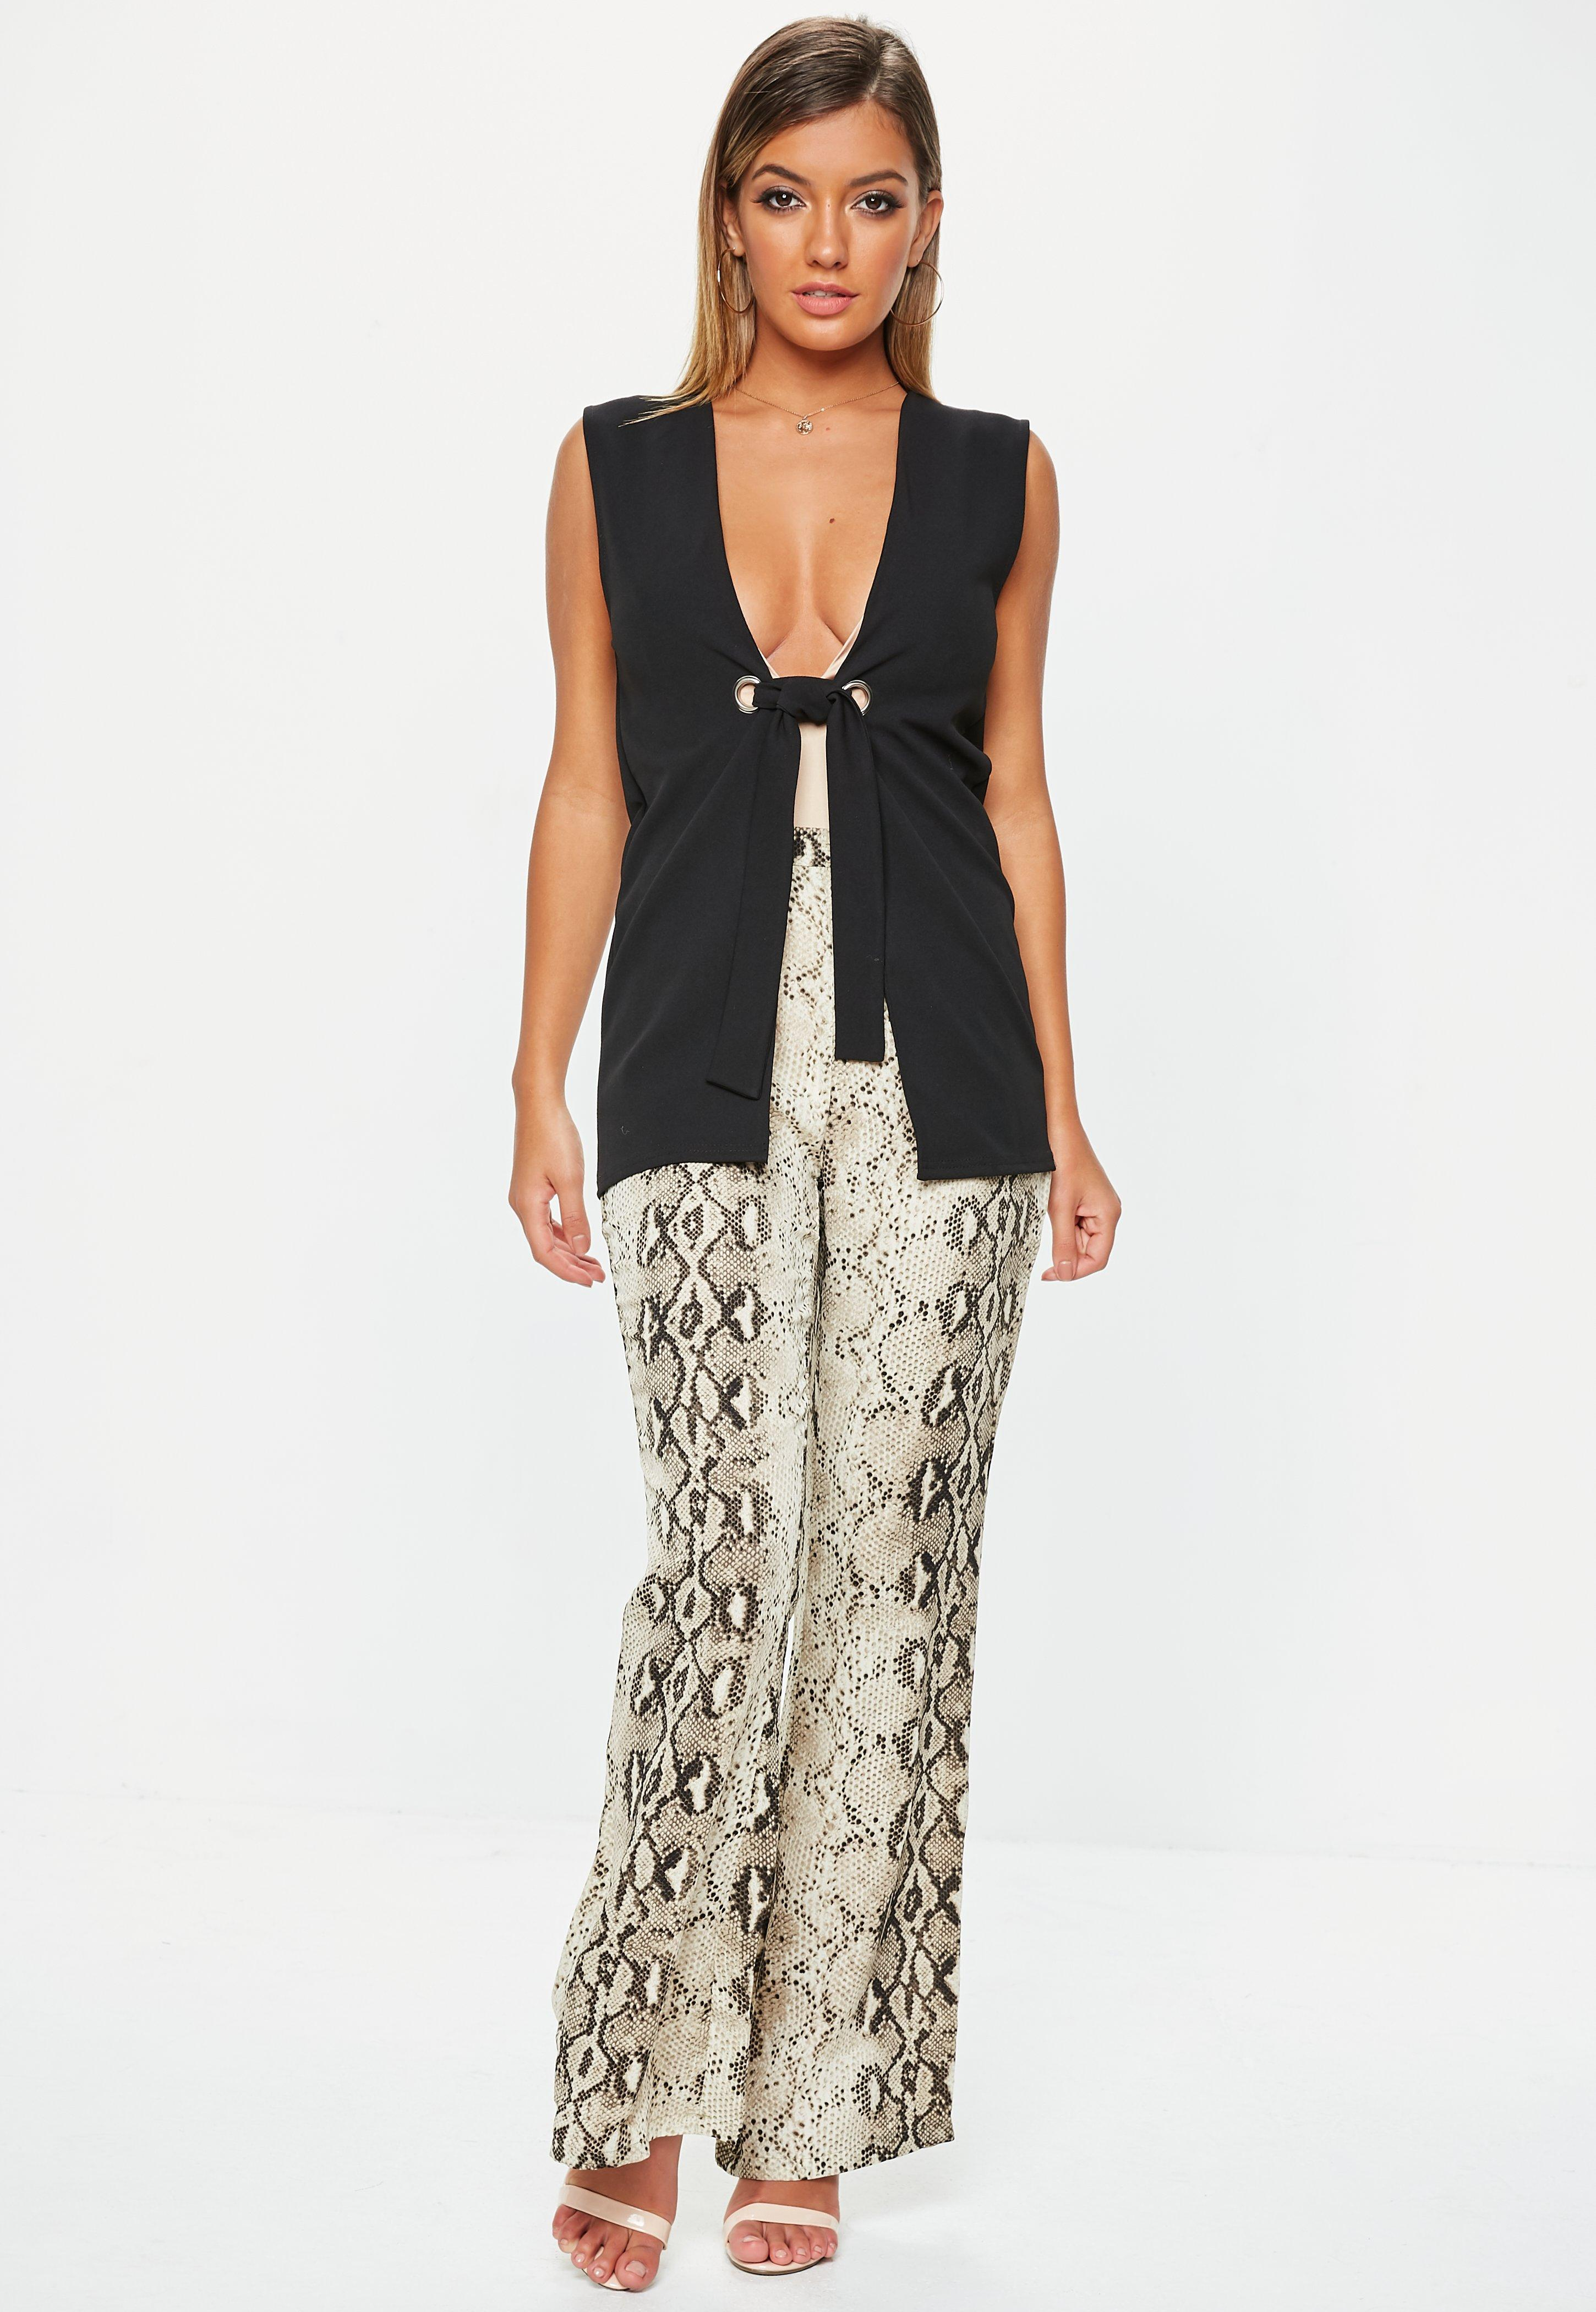 821a185f337024 Missguided - Black Sleeveless Tie Waist Blazer - Lyst. View fullscreen